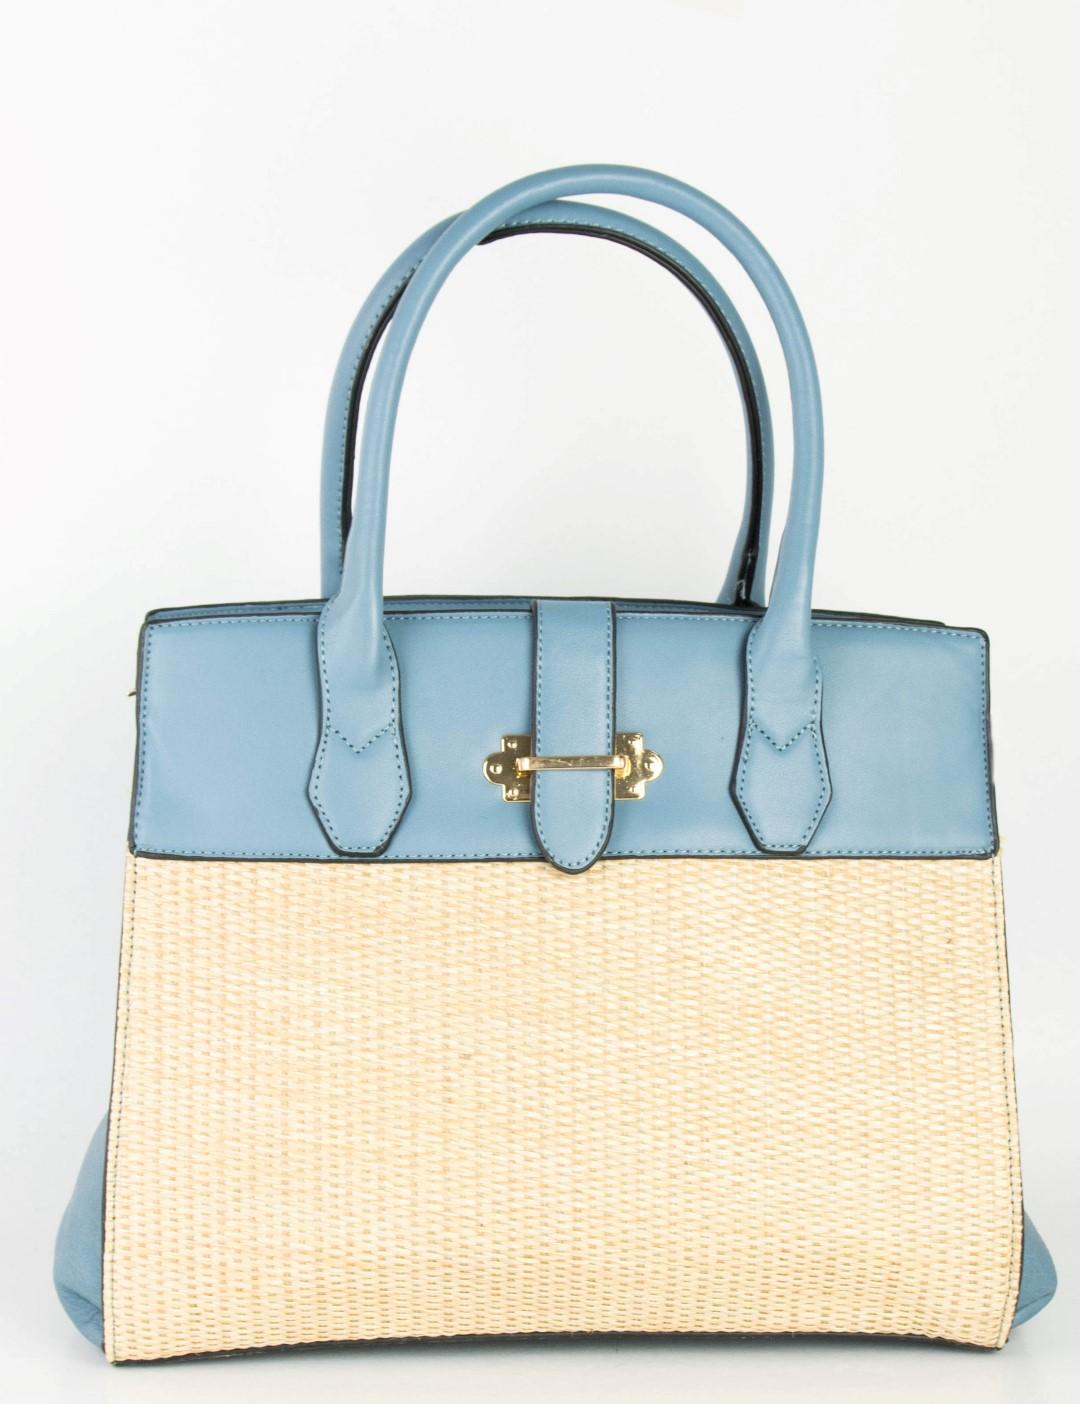 c9e4ae29aa Γυναικεία γαλάζια τσάντα ώμου ψάθινες λεπτομέριες 98573G. Λεπτομέρειες Αγορά